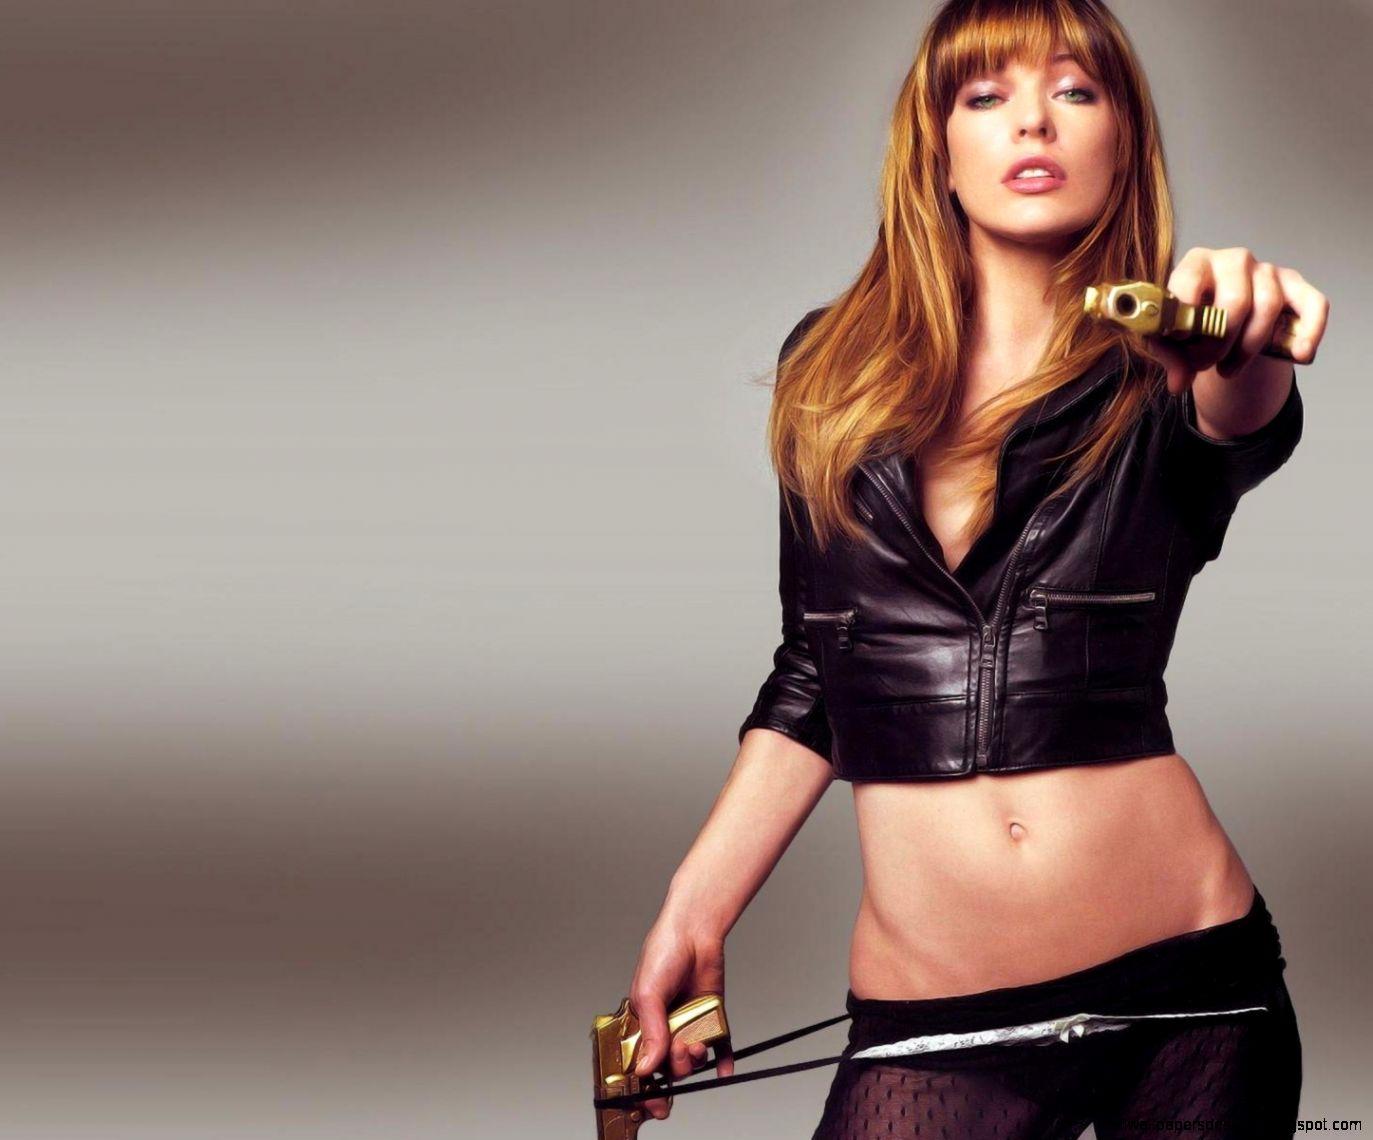 Milla Jovovich hot hd wallpapers   ACTRESS HD WALLPAPERS